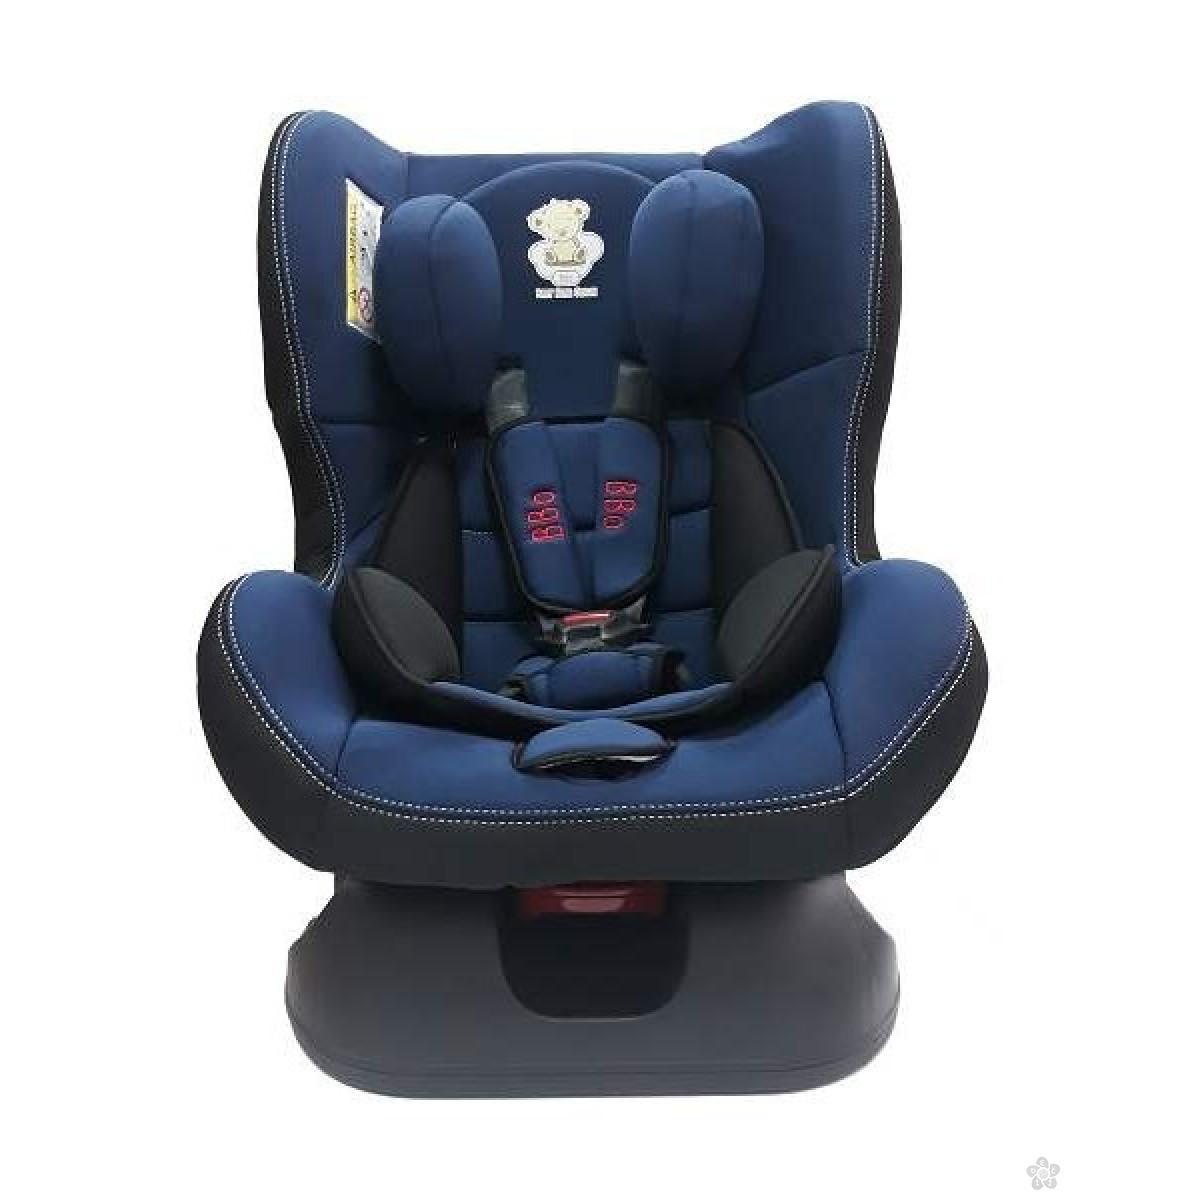 Autosedište BBO Rider tamno plavo 0-18kg